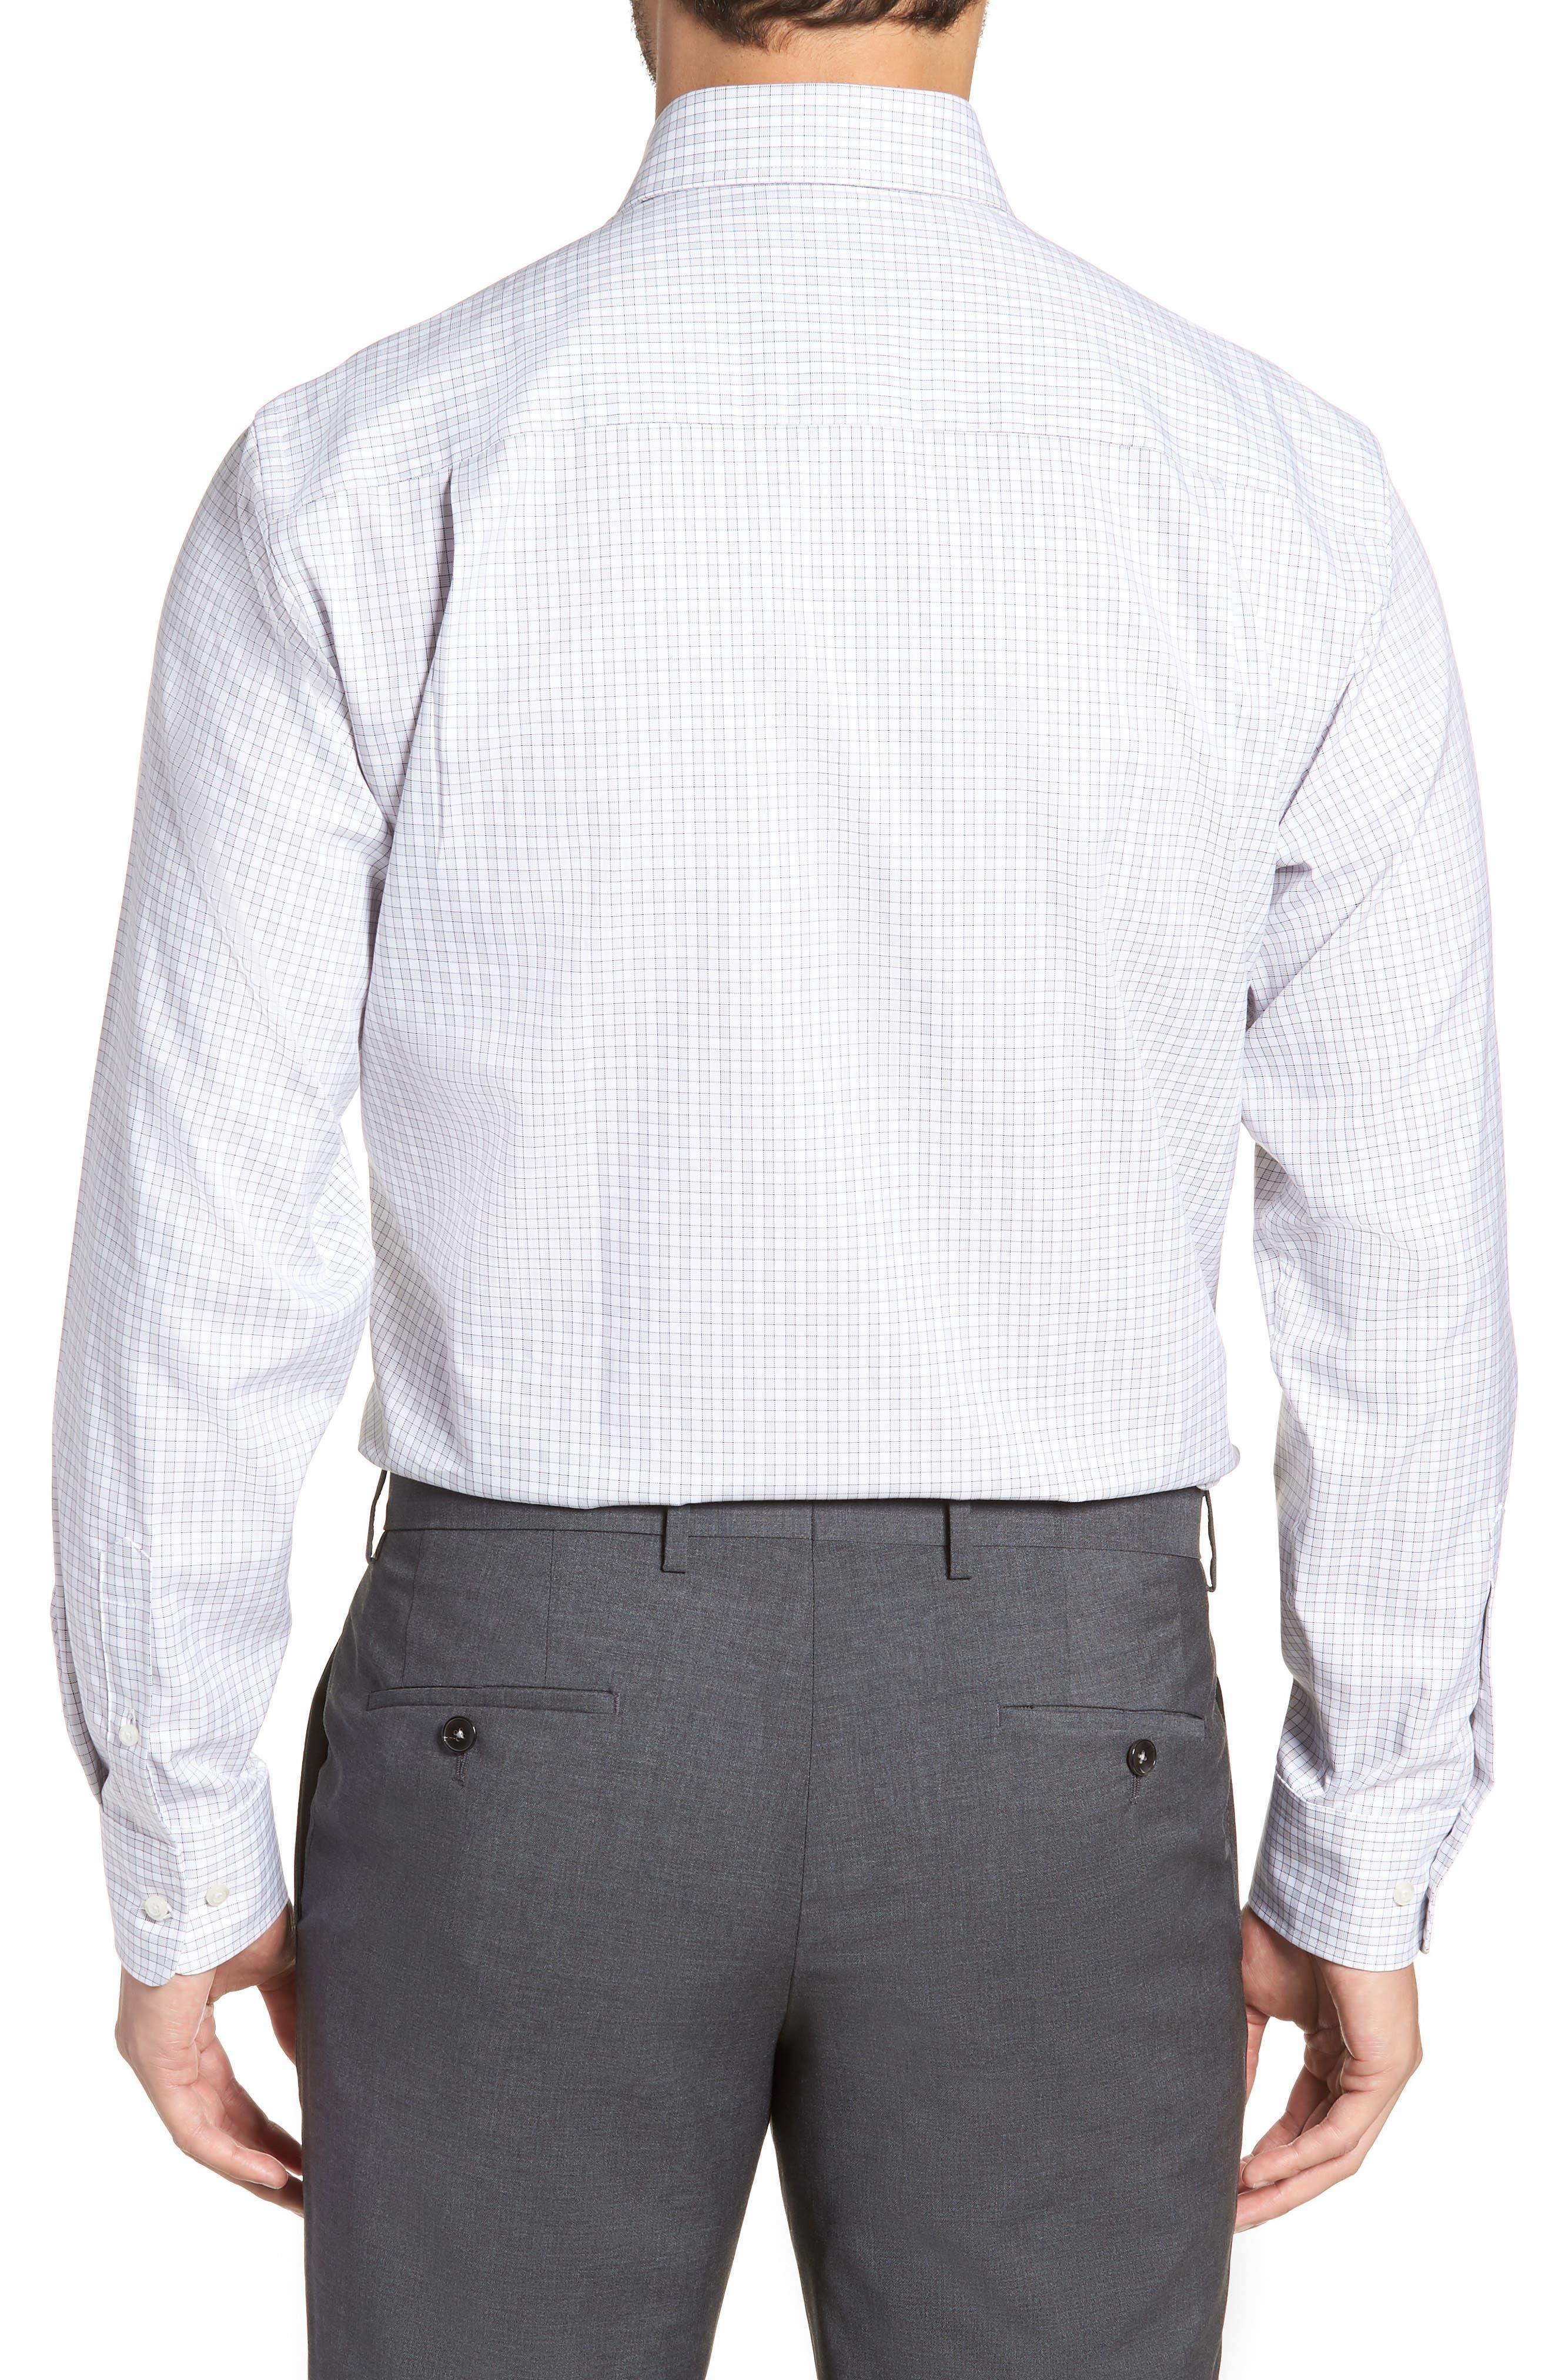 Regular Fit Check Dress Shirt,                             Alternate thumbnail 3, color,                             Gray